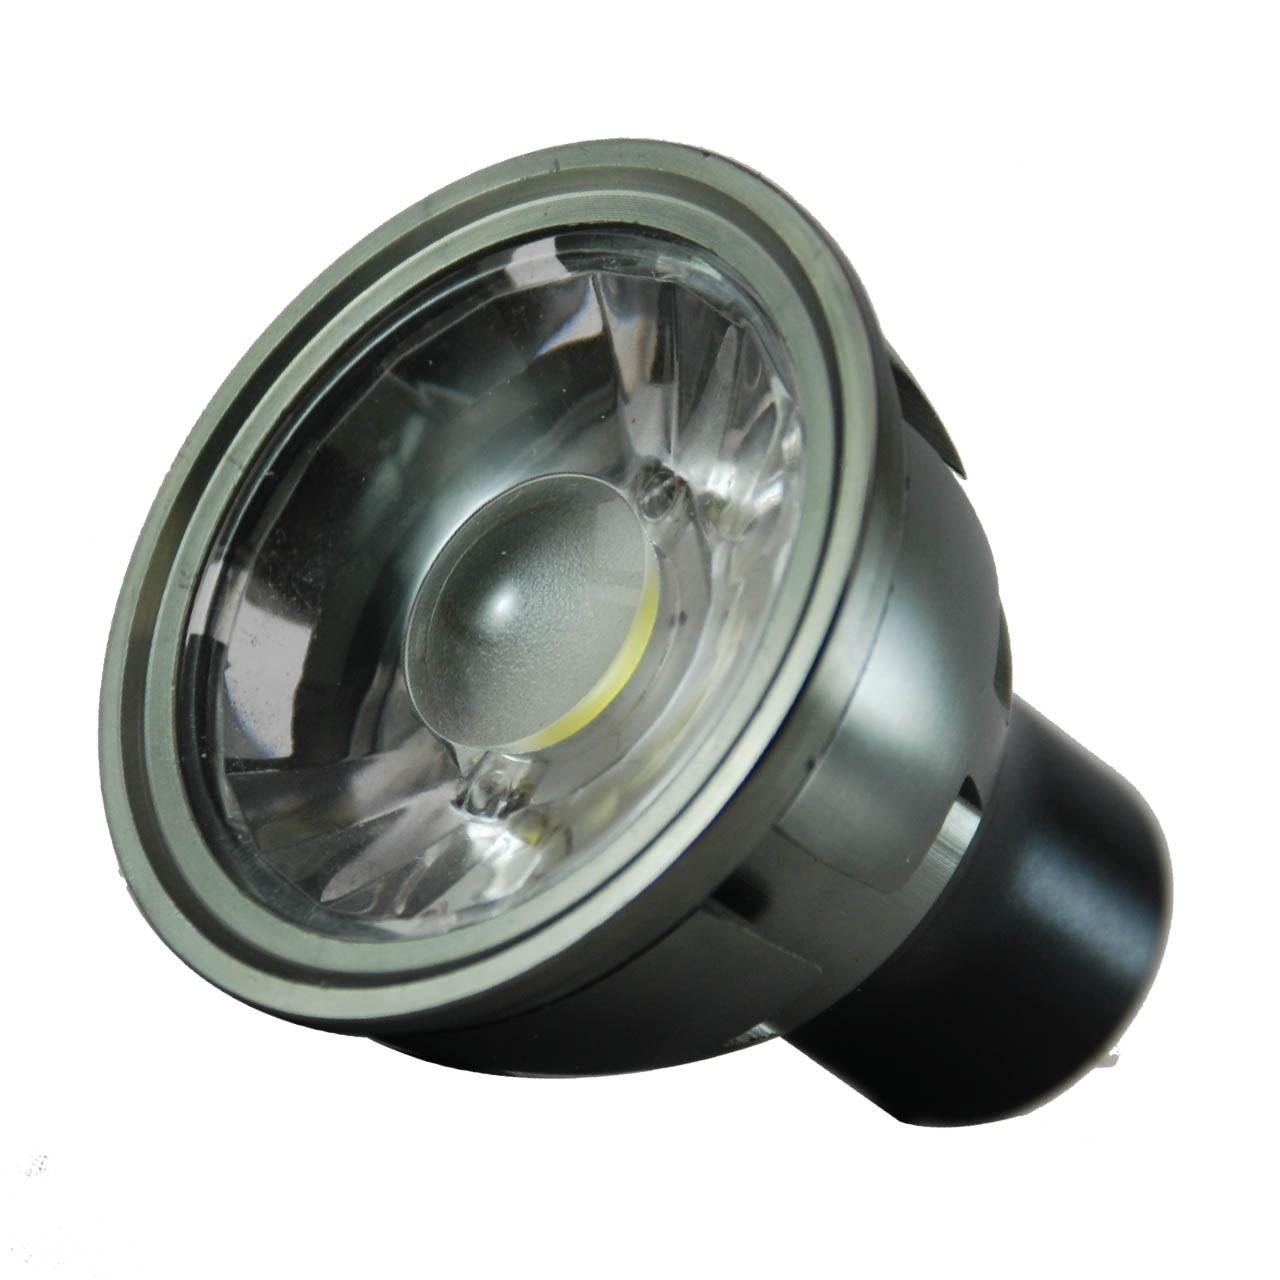 لامپ ال ای دی 5 وات تکنوتل مدل 5505 پایه GU5.3